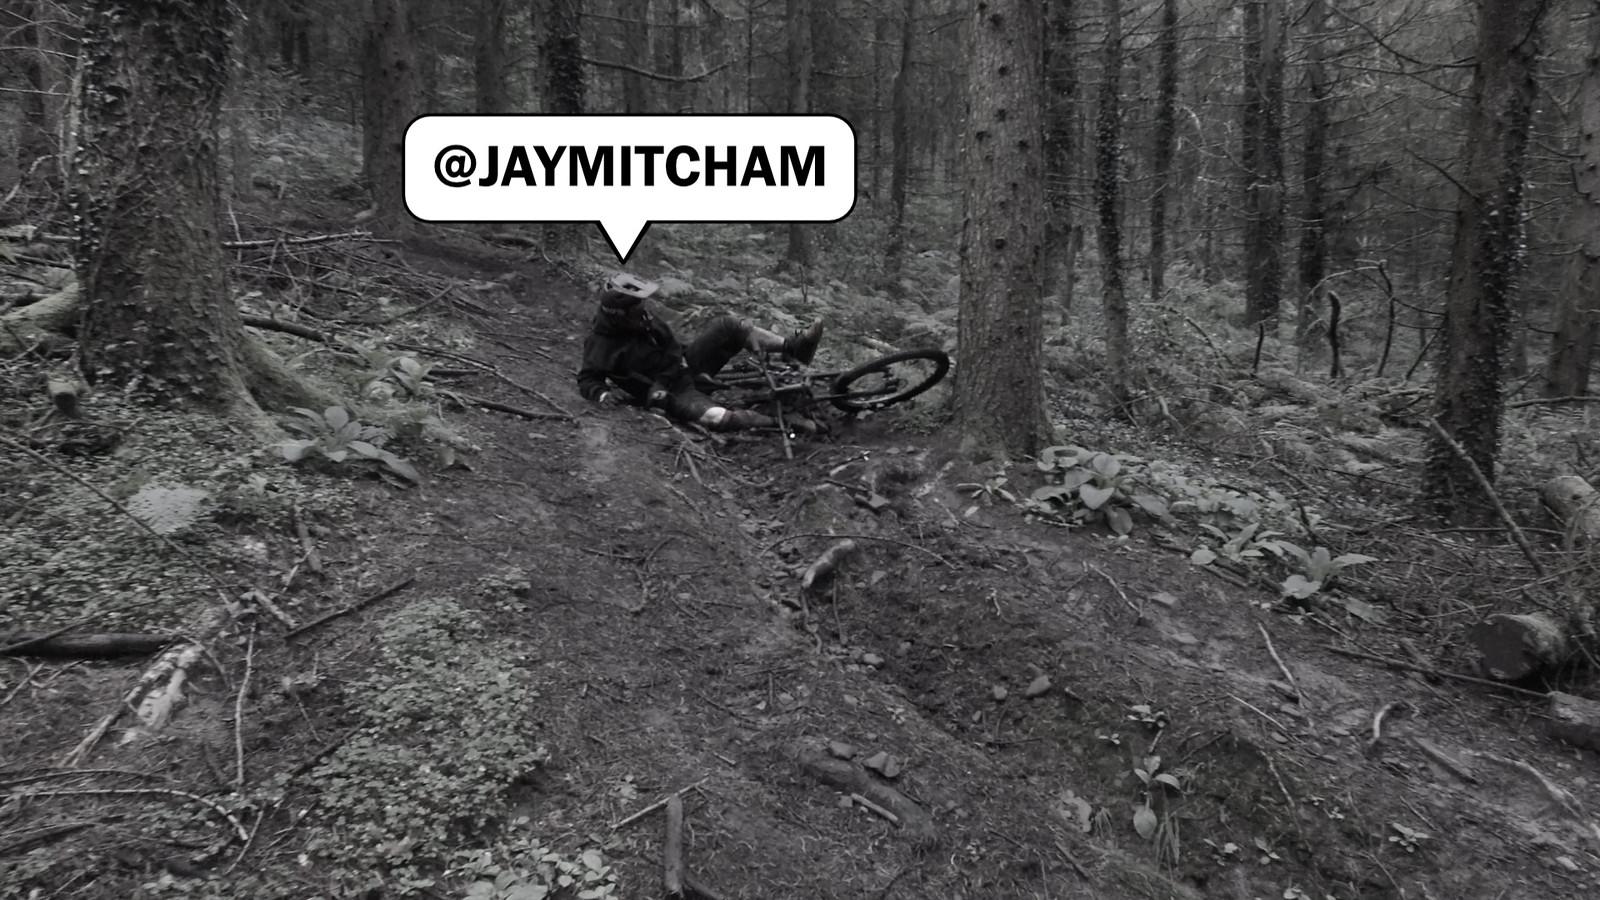 J - Matthew Davies - Mountain Biking Pictures - Vital MTB